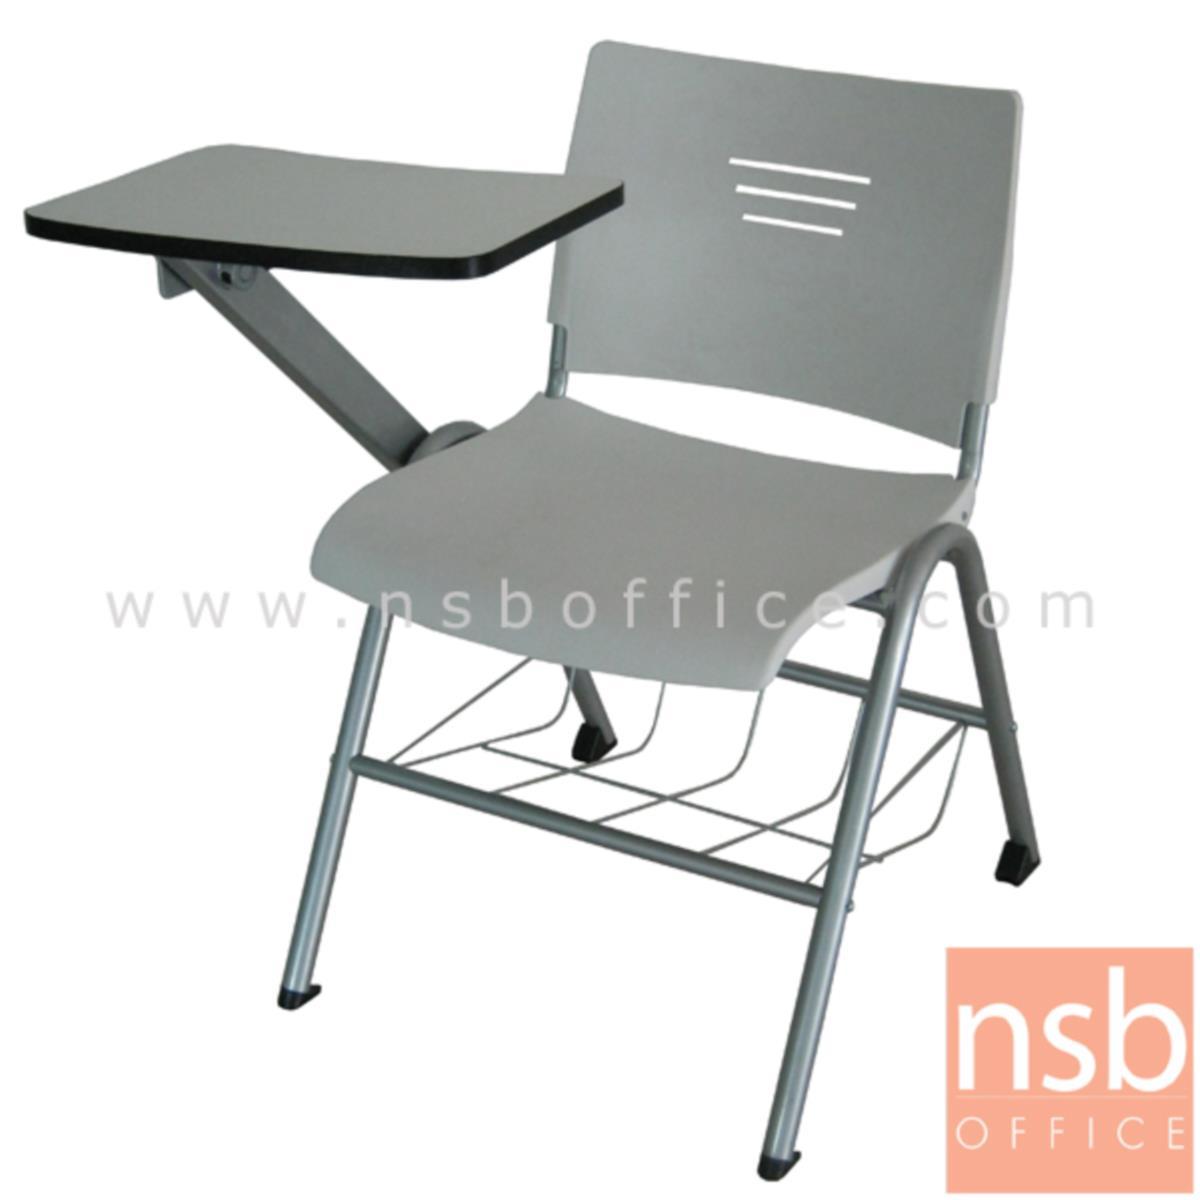 B07A076:เก้าอี้เลคเชอร์เฟรมโพลี่ รุ่น Orville (ออวิลล์) (มีตะแกรงวางของ) ขาเหล็กพ่นเทา